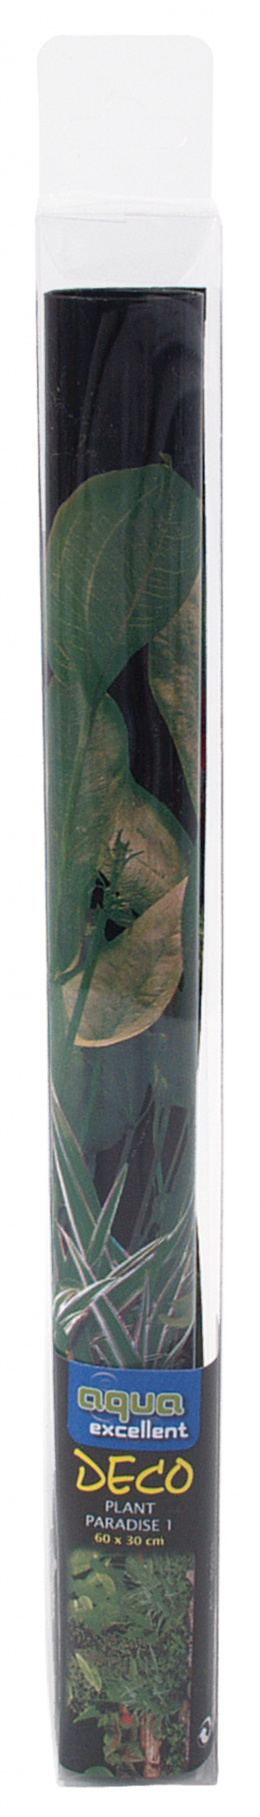 Fons akvārijam - Augi 80*40cm